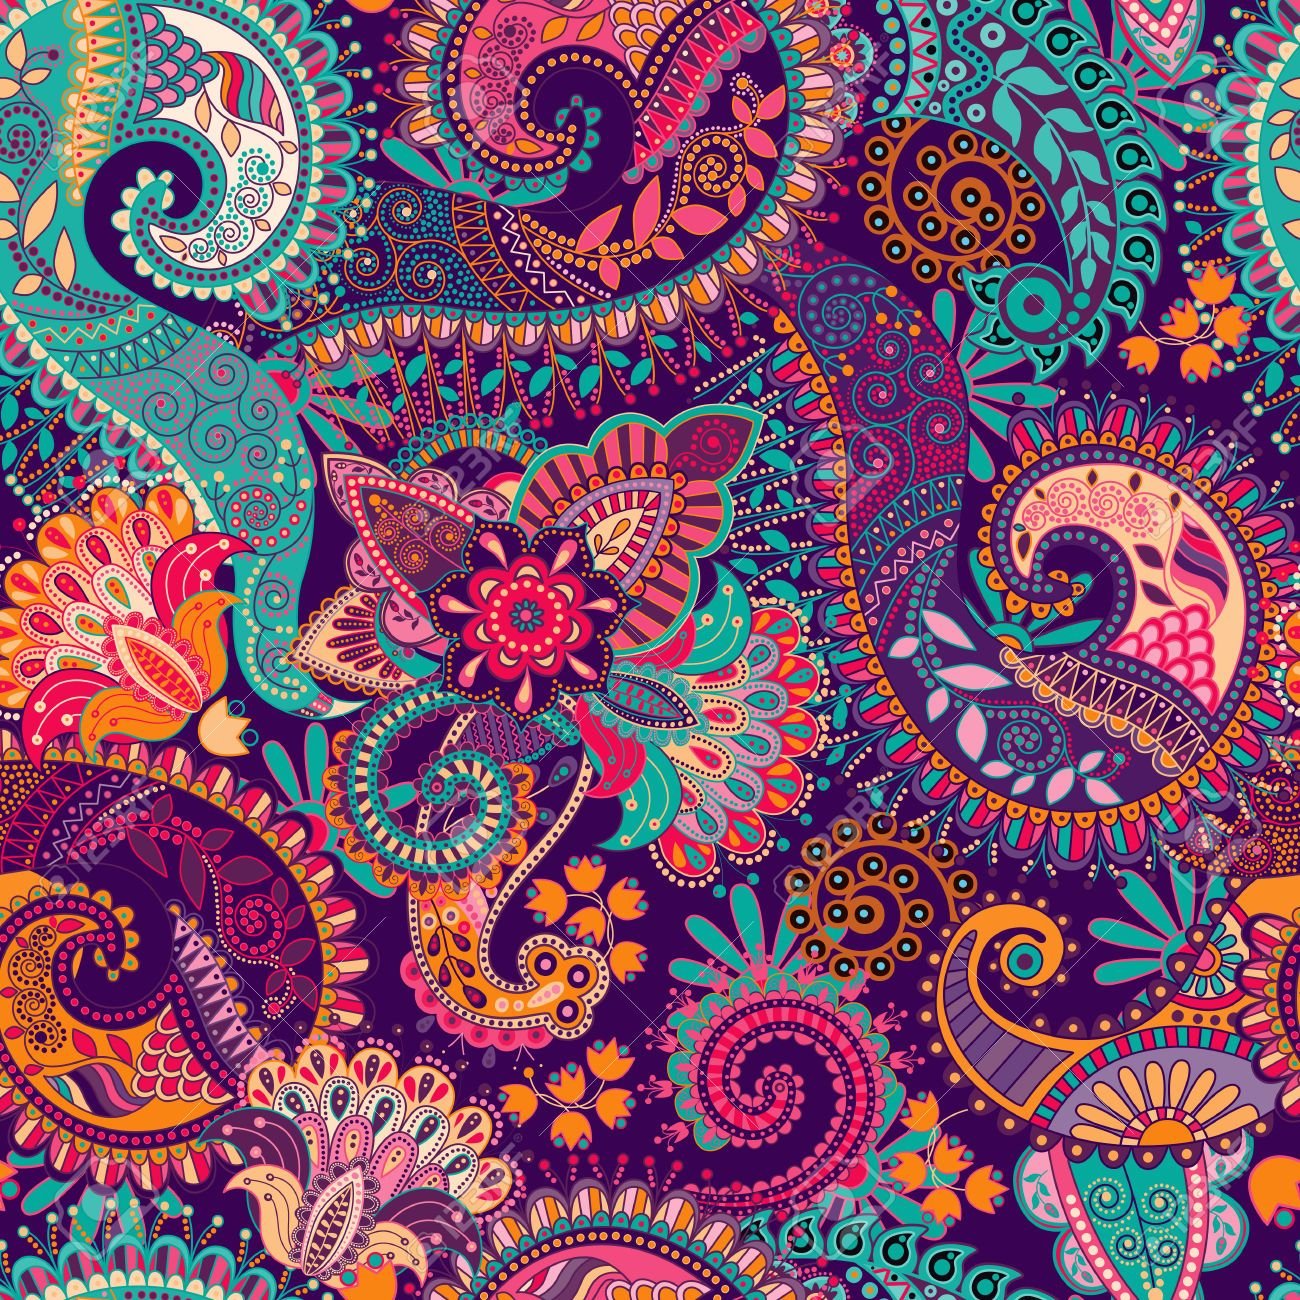 45889865 paisley seamless pattern floral wallpaper fantasy for Paisley wallpaper